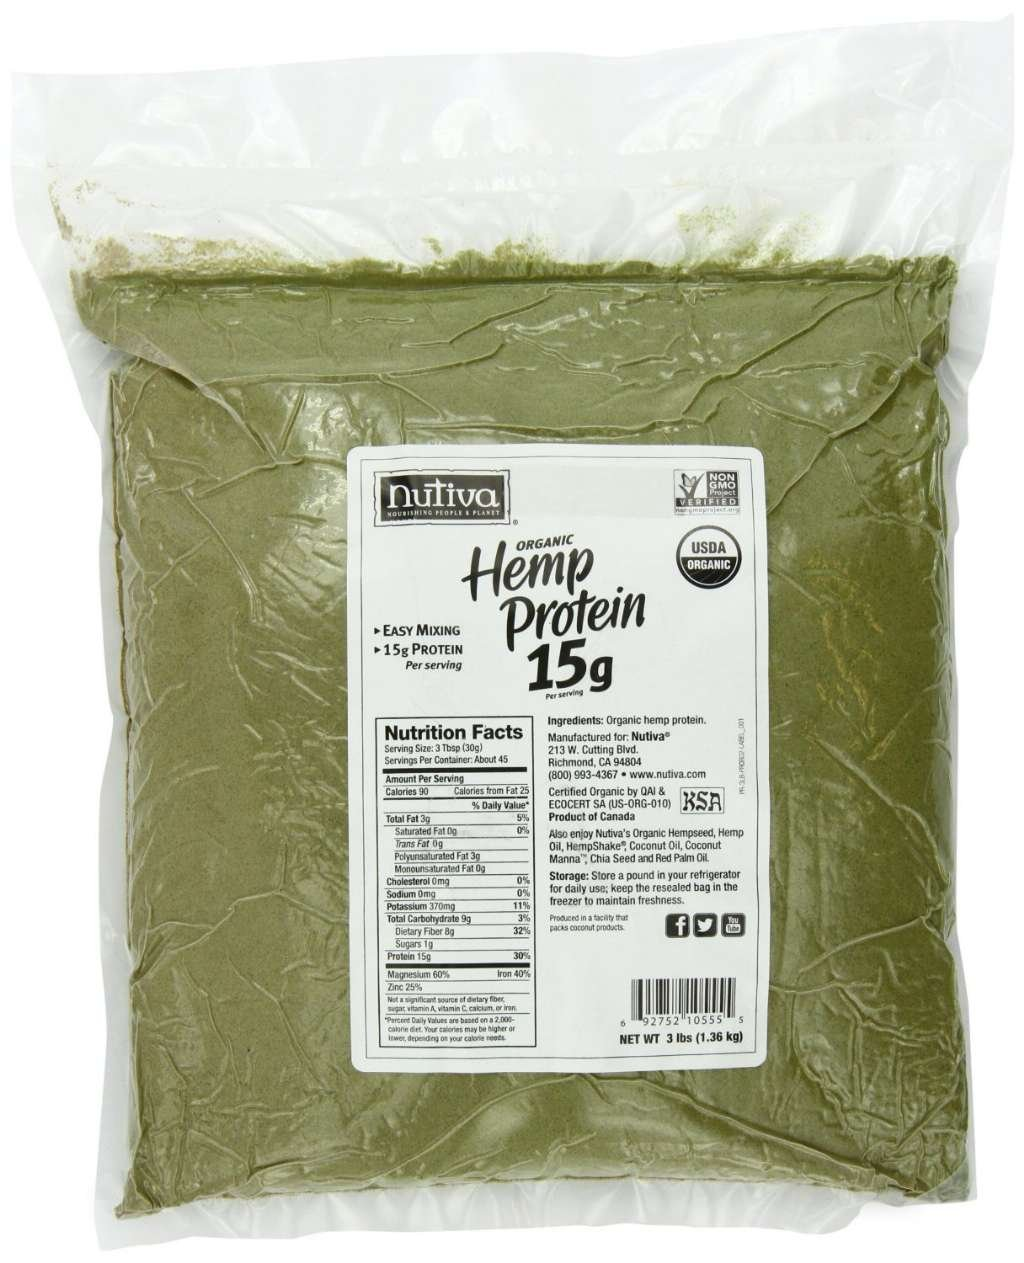 Nutiva Organic Hemp Protein, 4 Pack